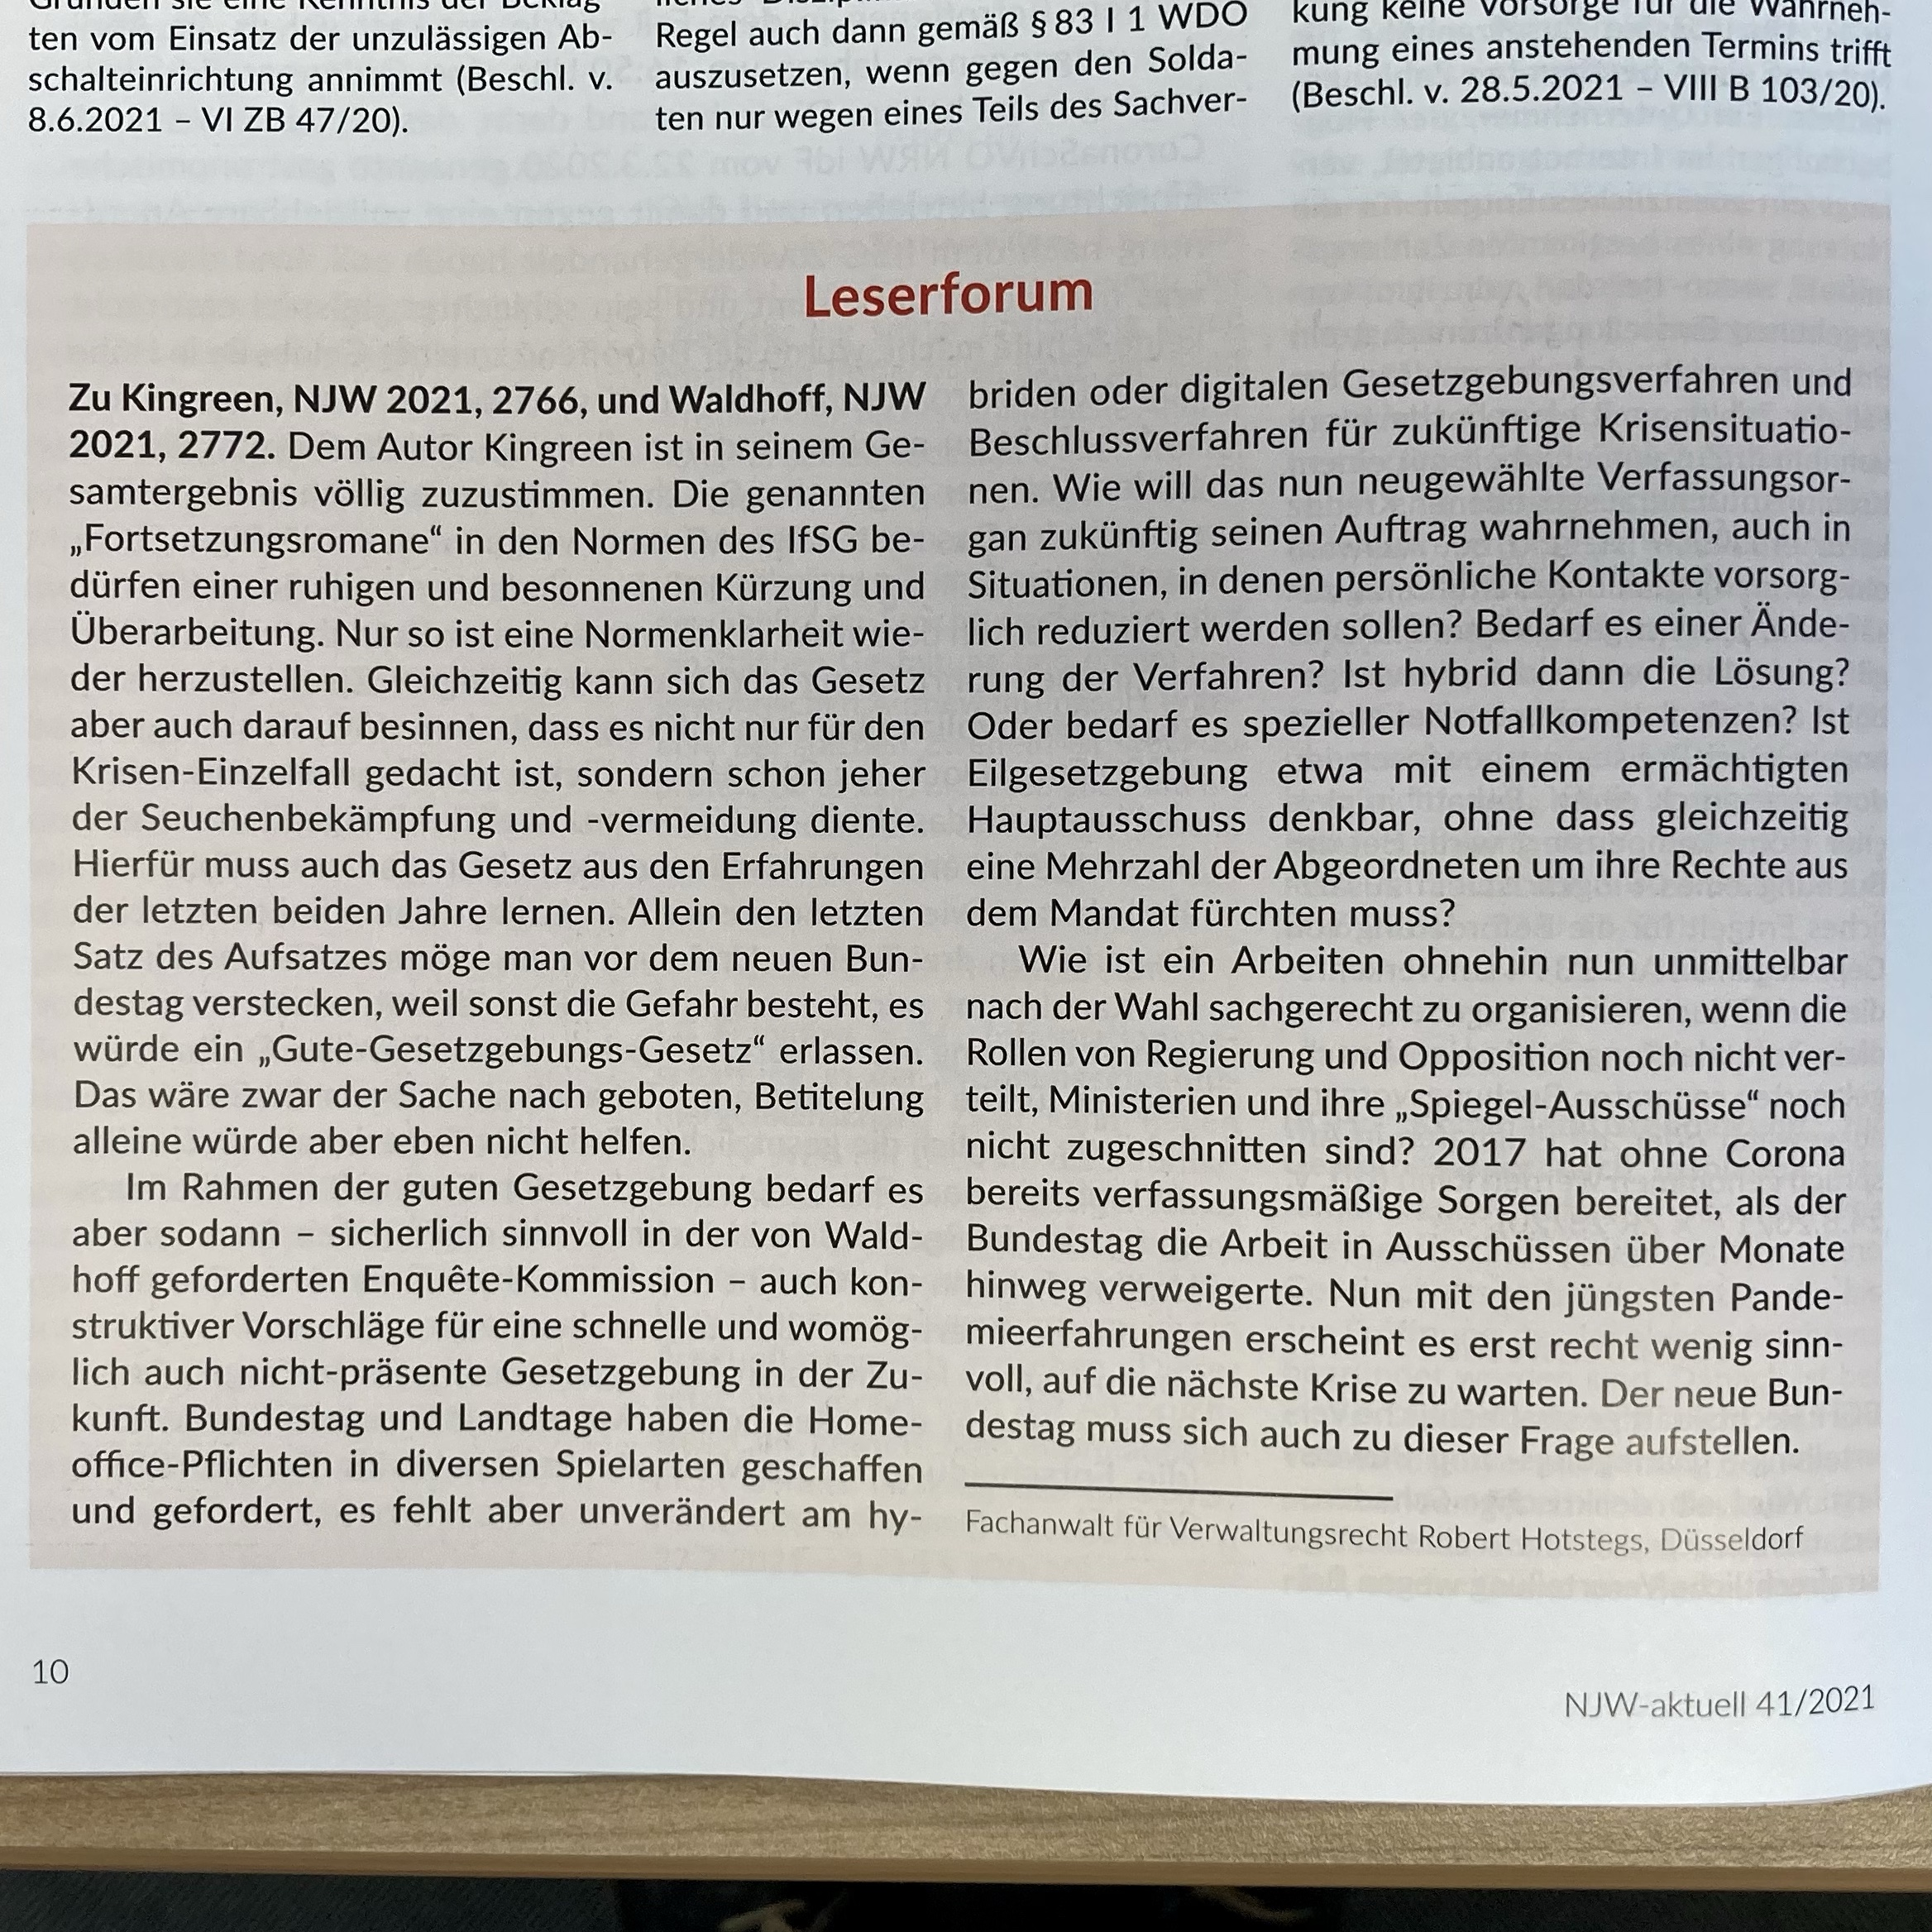 Leserforum, NJW-aktuell 46/2021, 10